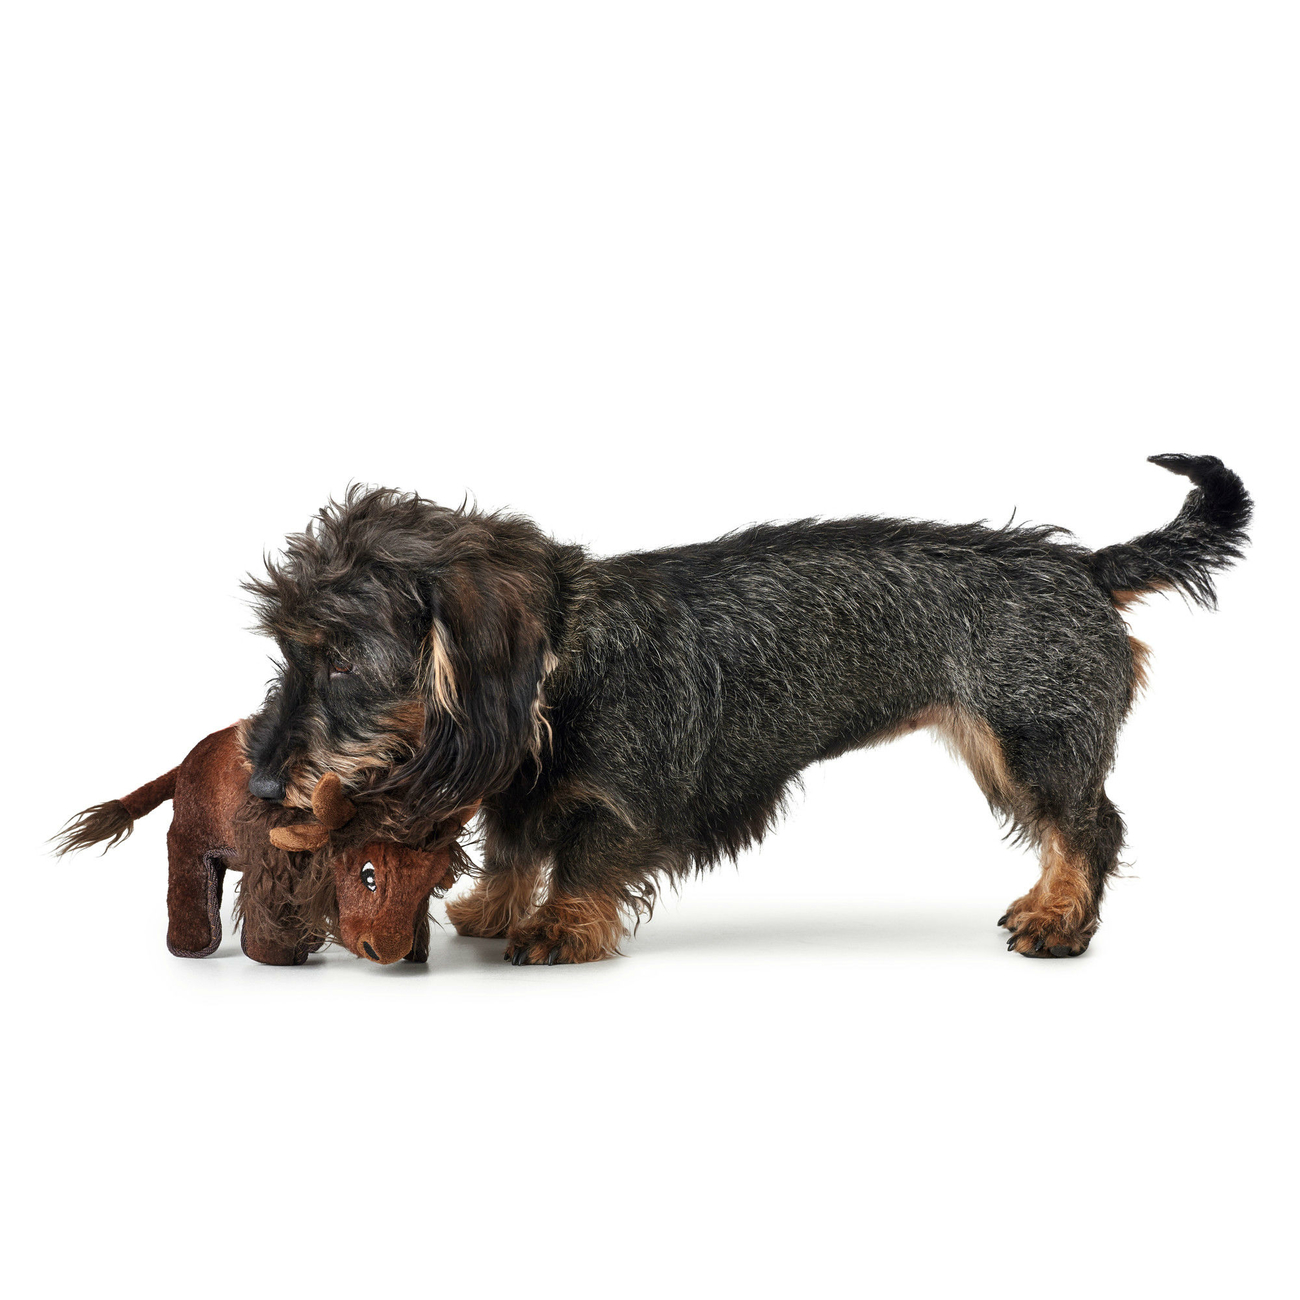 Hunter Hundespielzeug Tough Kamerun Stofftier 65719, Bild 7